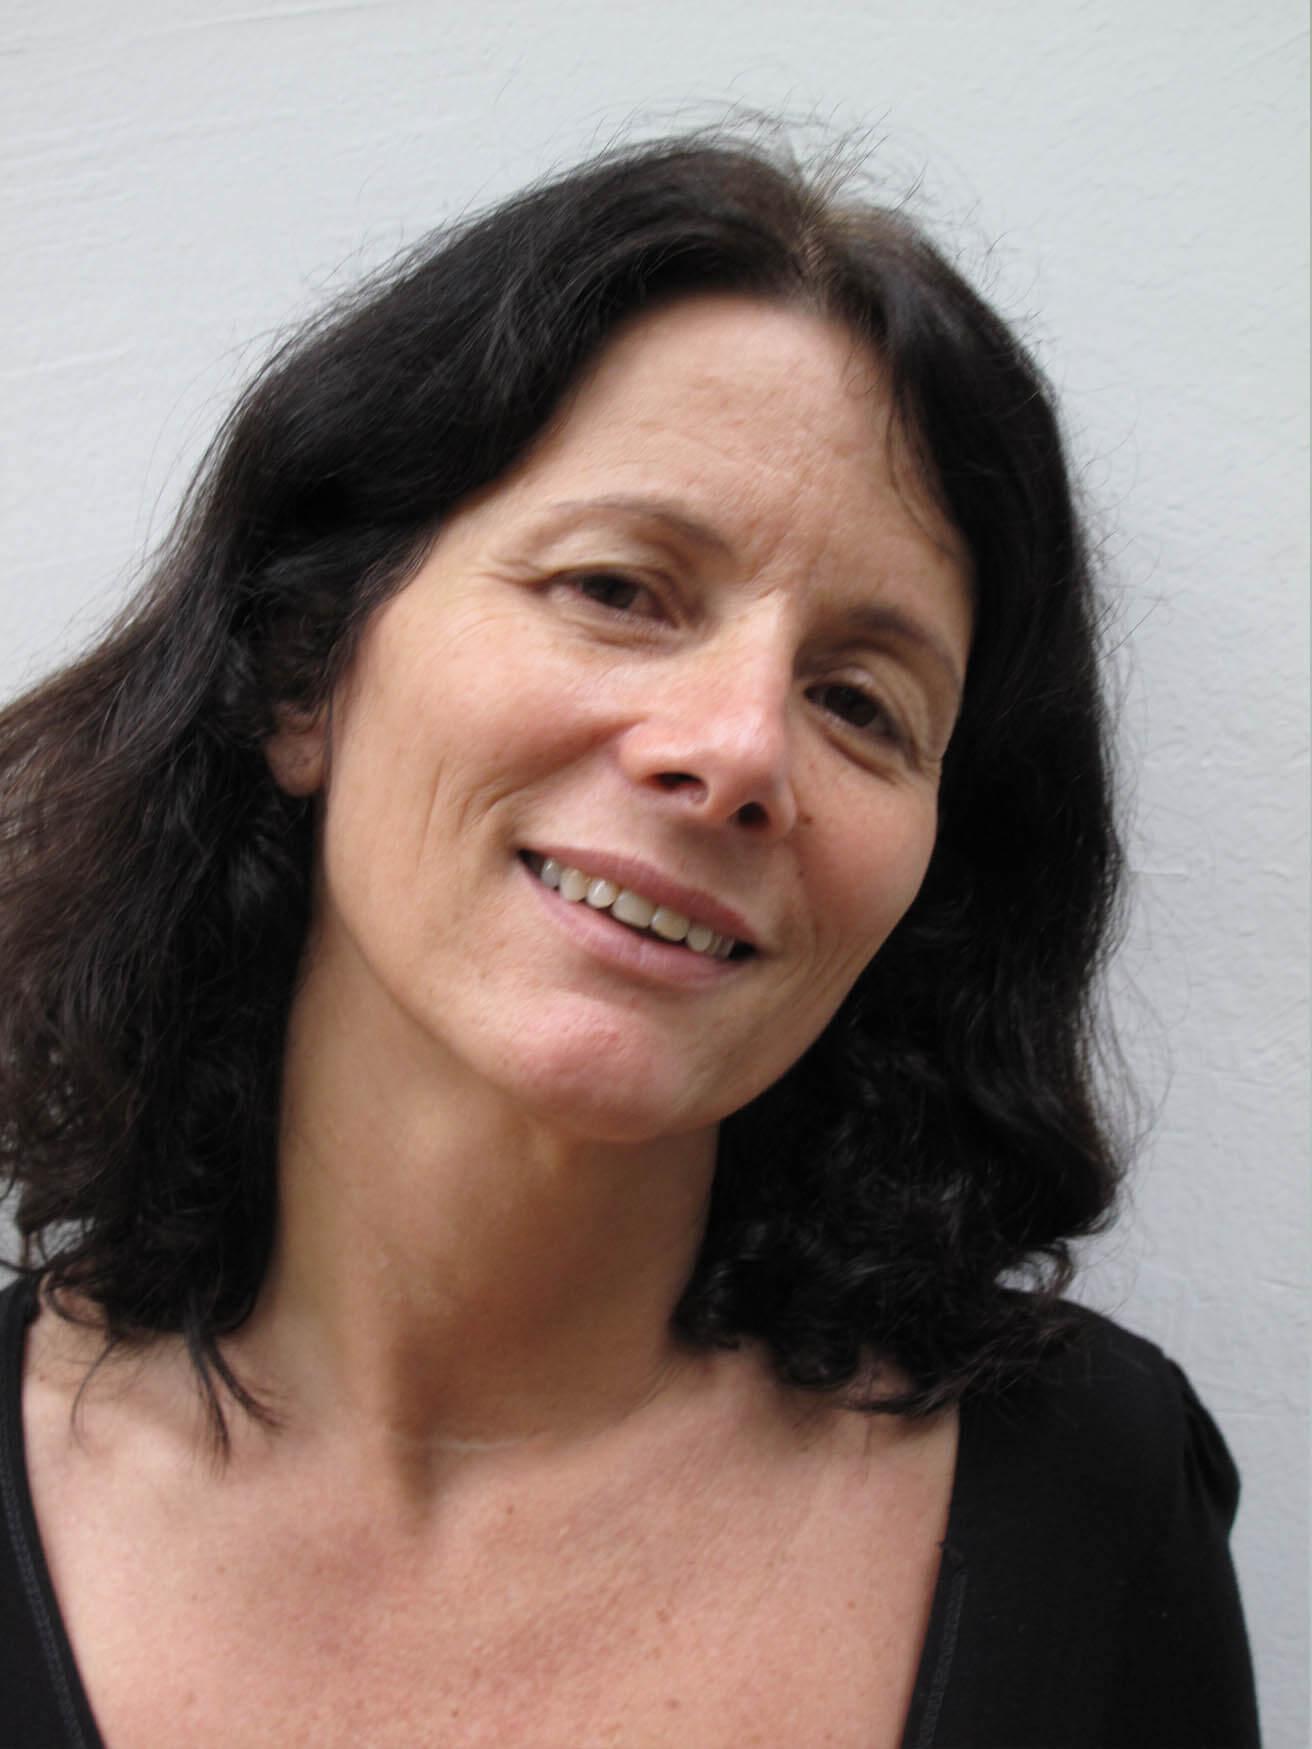 PATRICIA LUSTOZA DE SOUZA